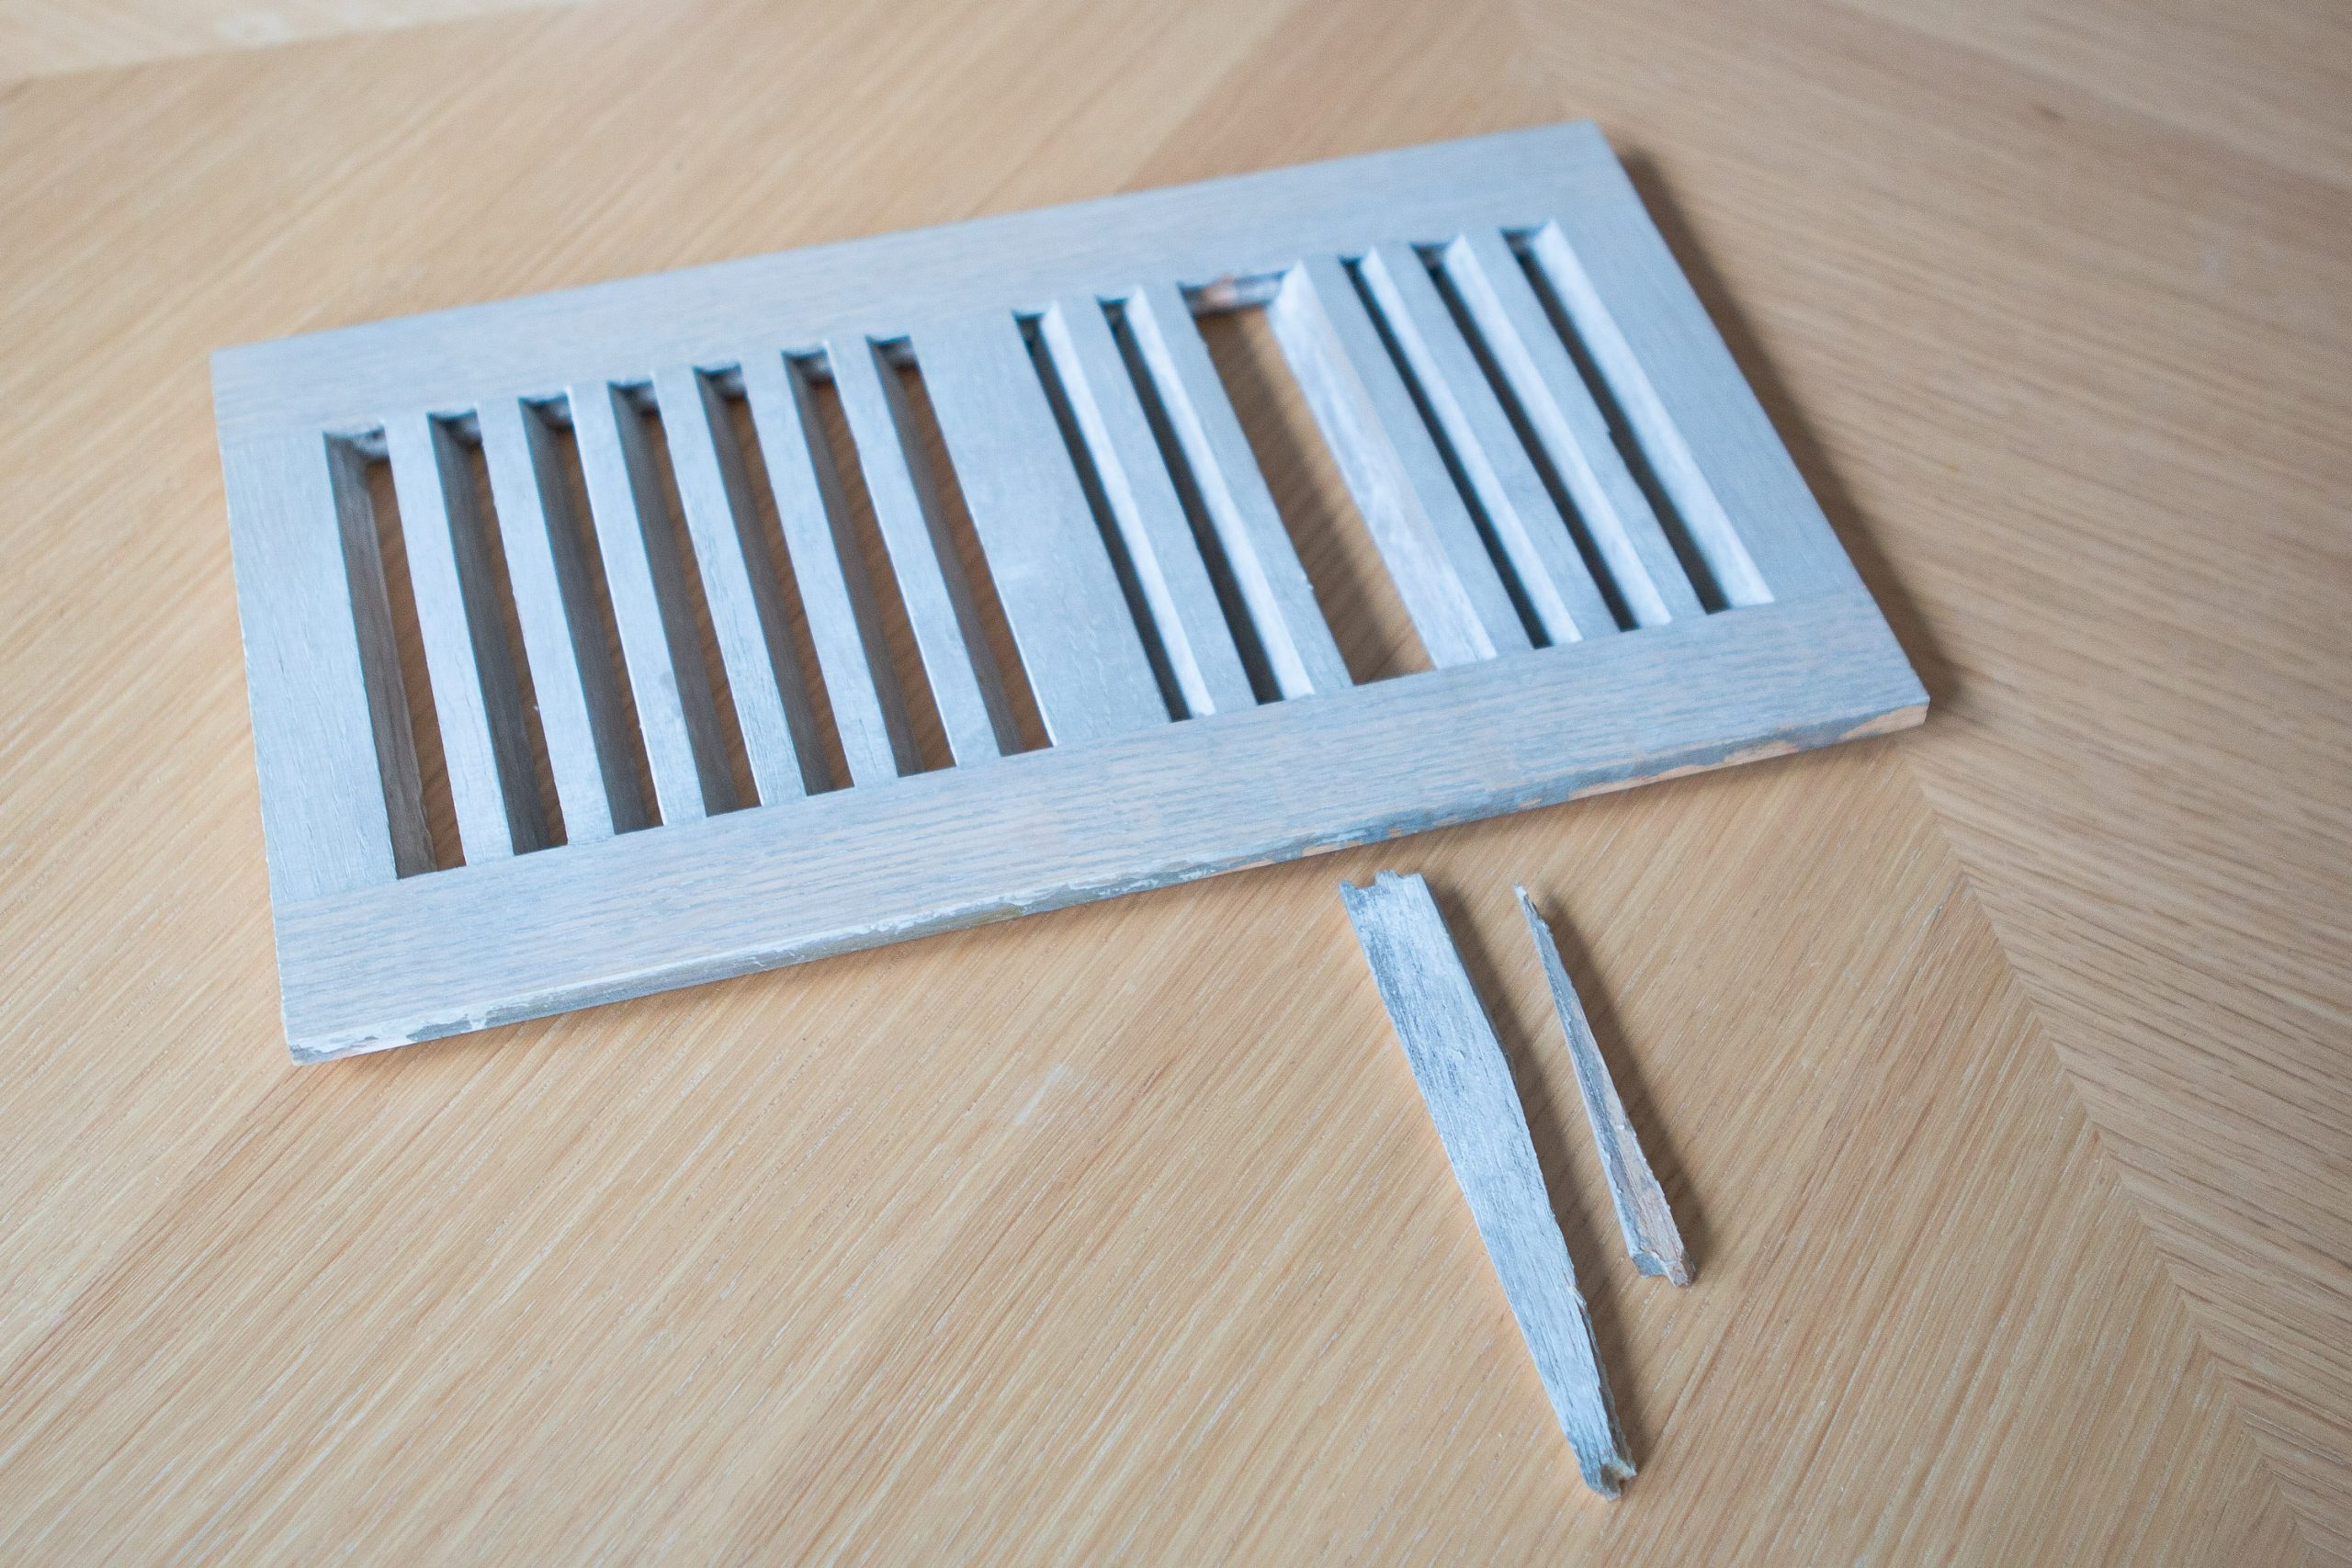 Using super glue to fix our wood floor register